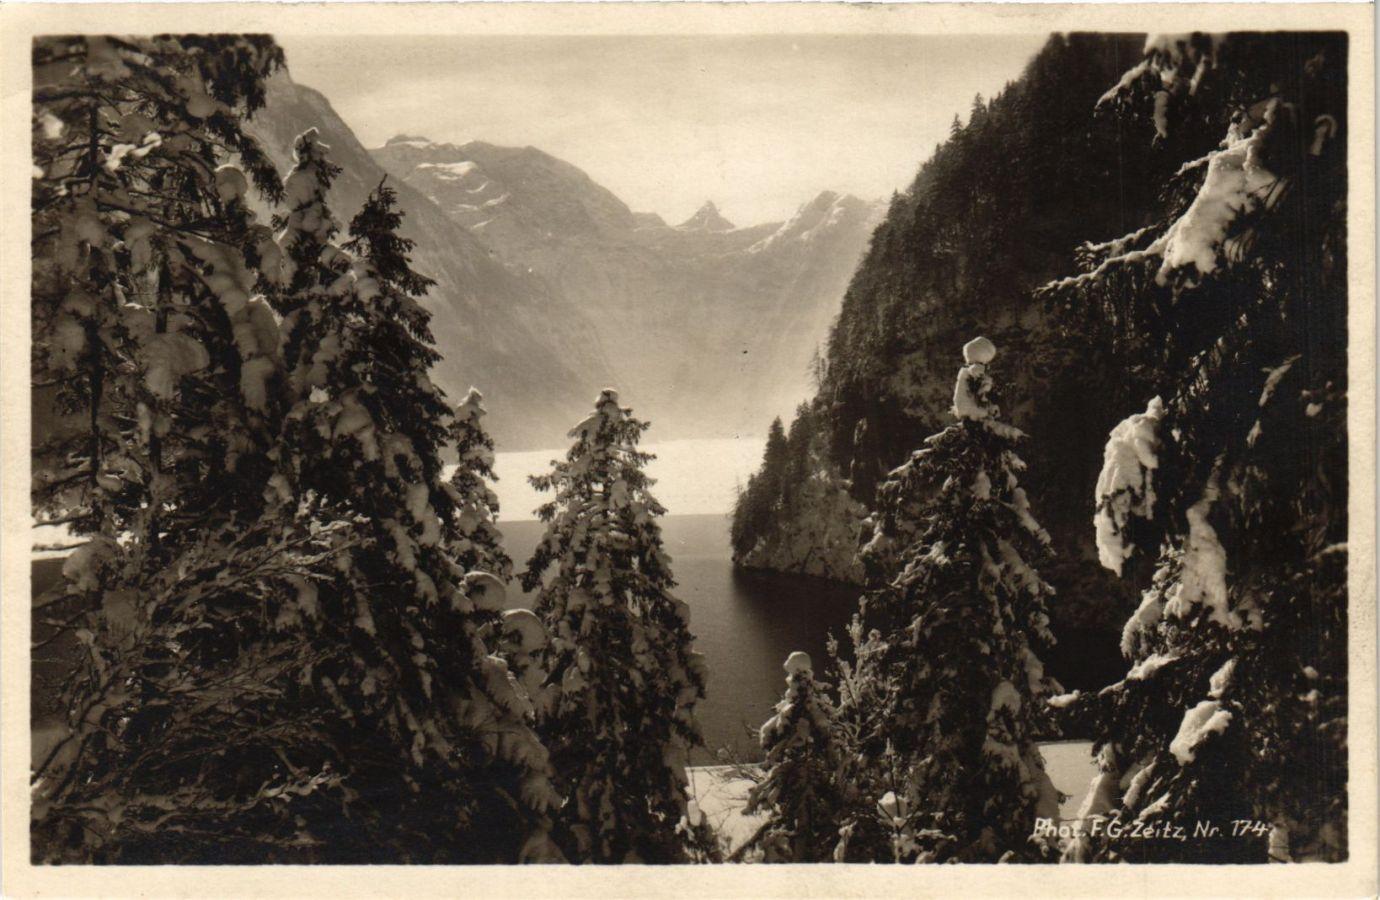 CPA-AK-Konigssee-aus-dem-Berchtesgadener-land-GERMANY-878872